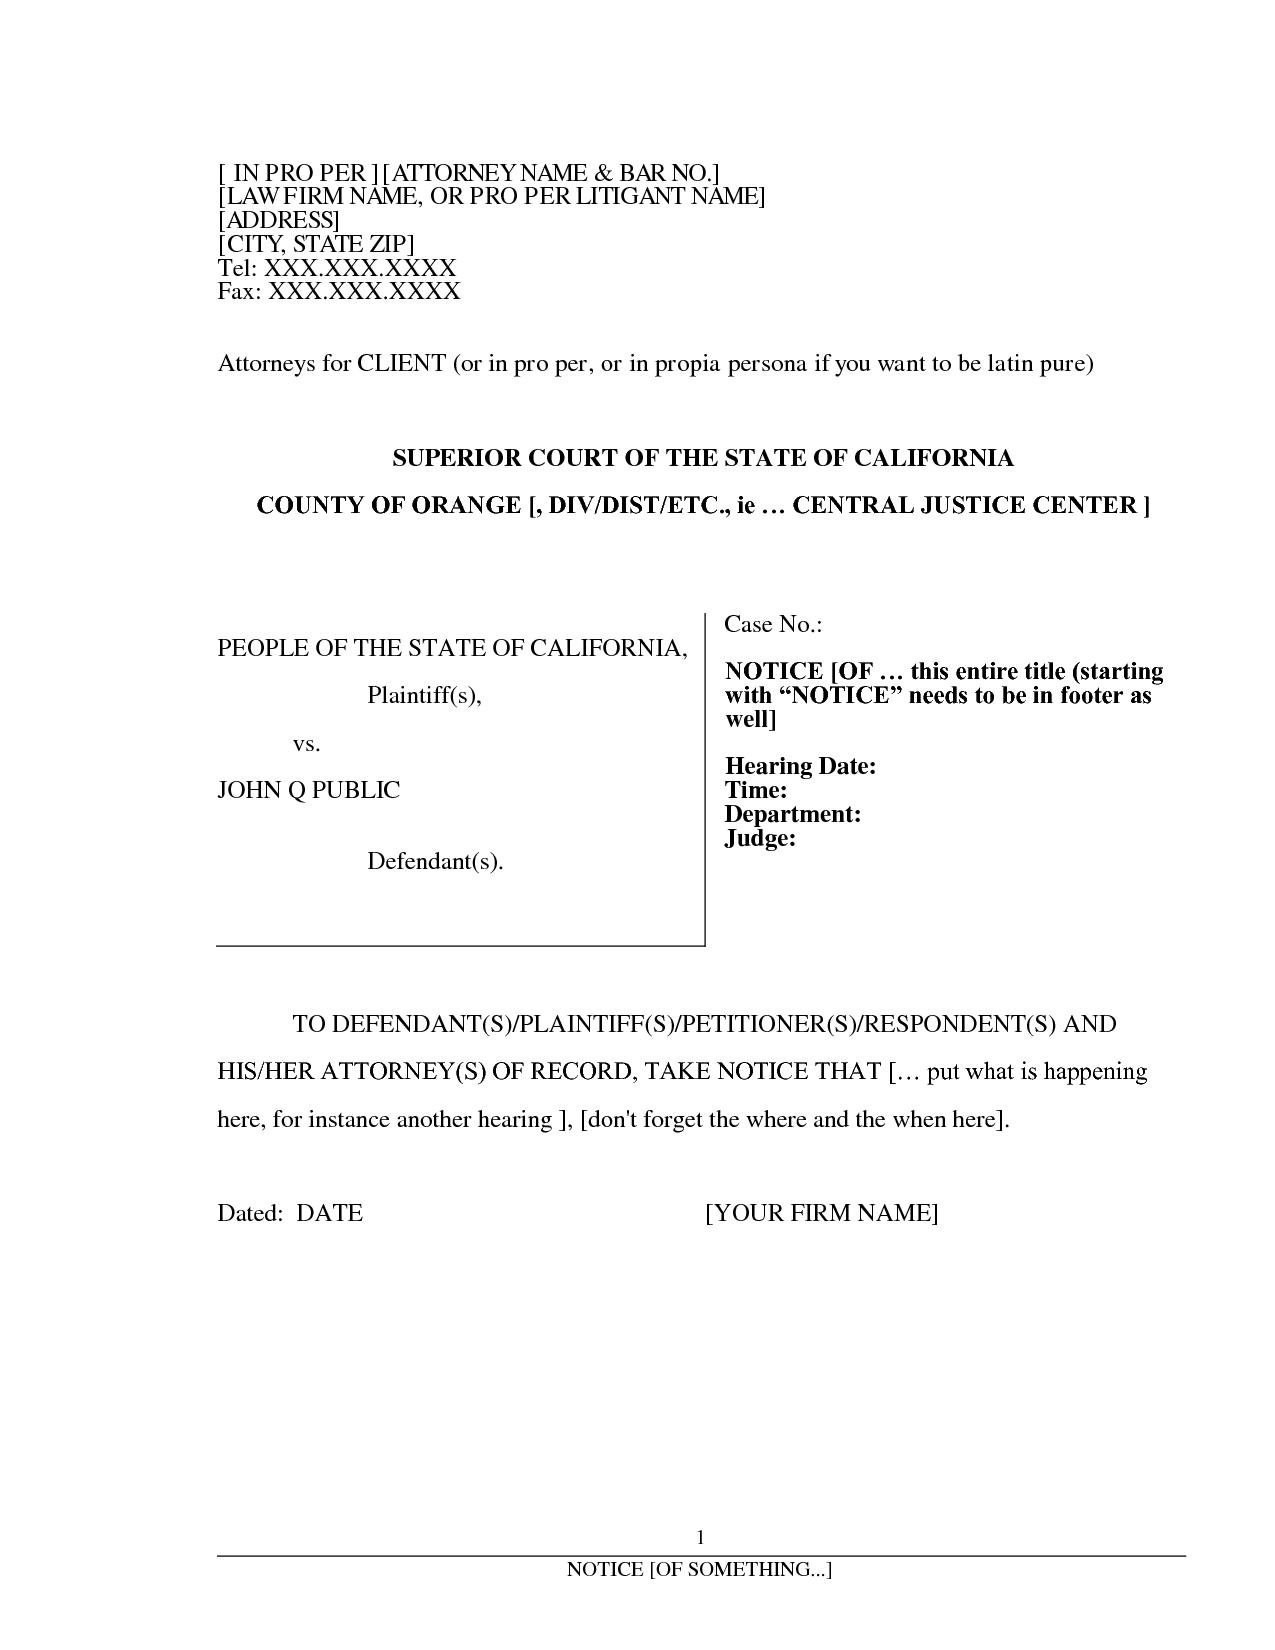 california legal pleading paper are you a pro per litigant who needs